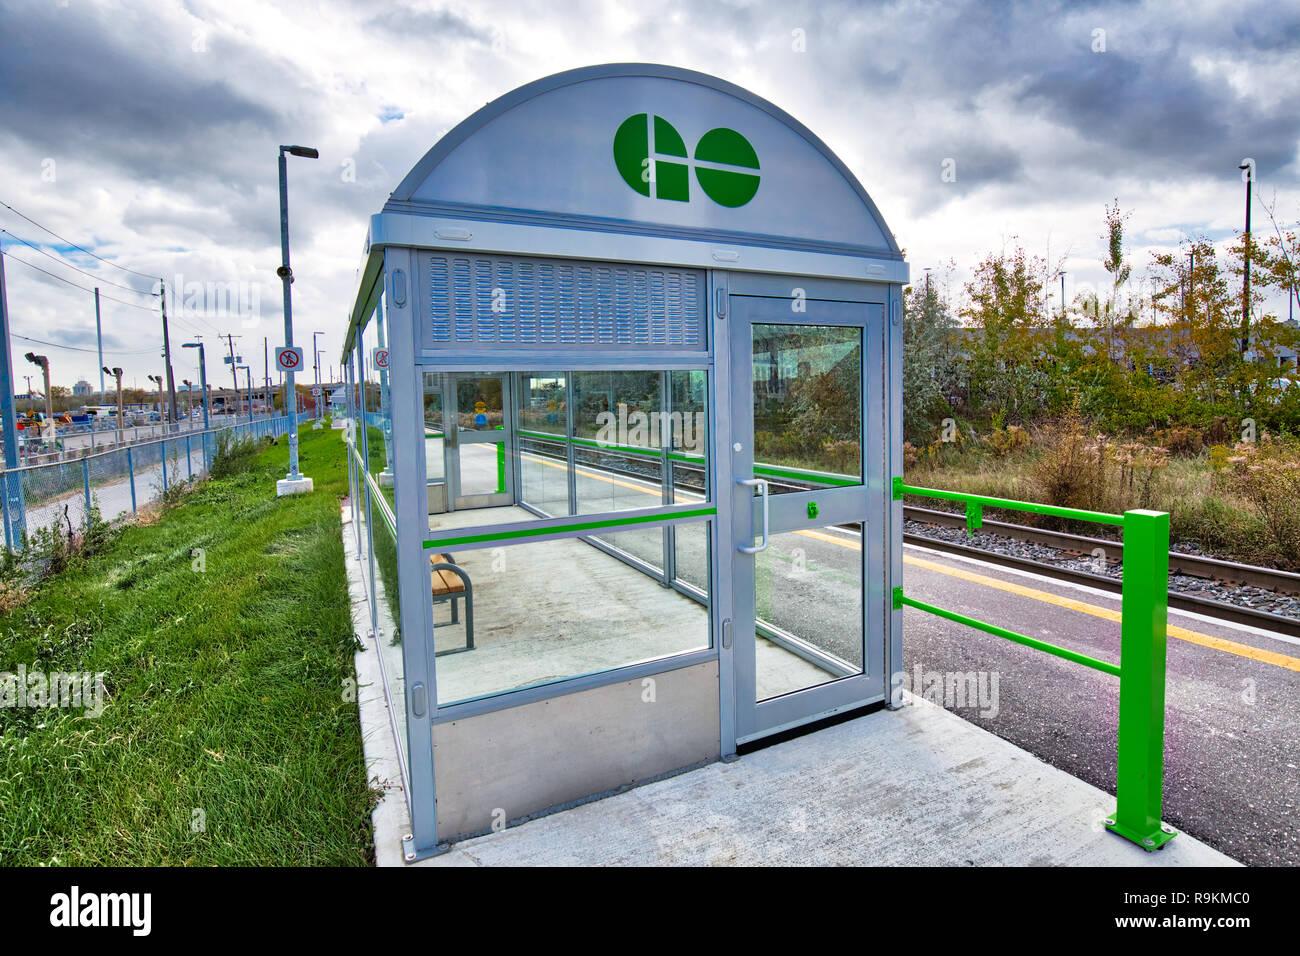 Toronto, Canada-20 November, 2018: Go Train Stations, a regional public transit system serving the Greater Golden Horseshoe region of Ontario Stock Photo